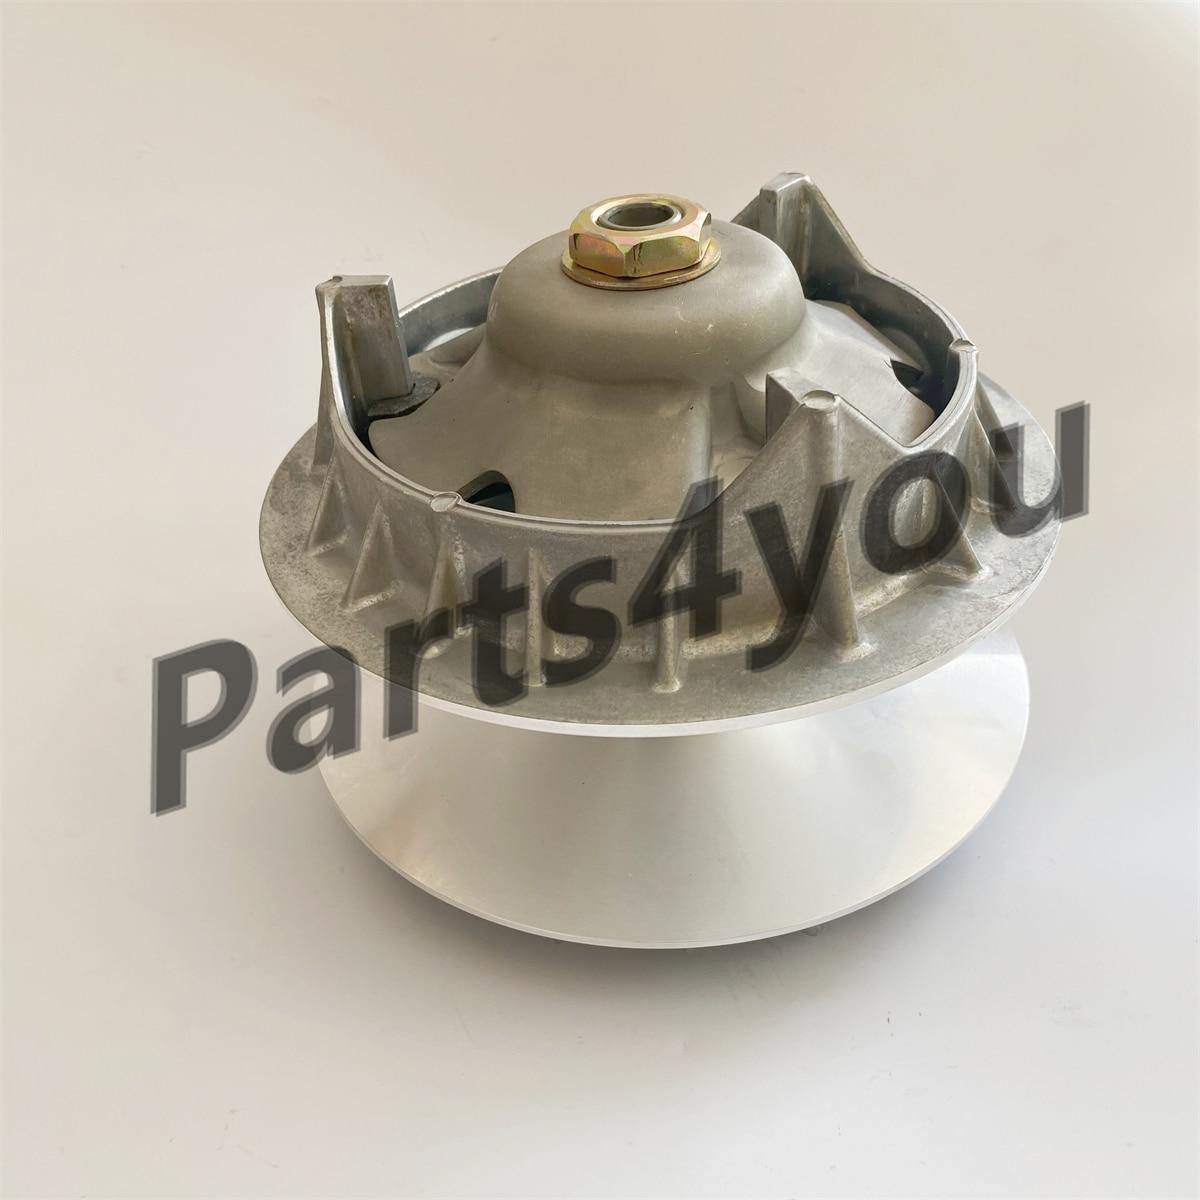 Primary Clutch Drive Clutch for Hisun 800cc 800 HS800 ATV UTV HS800 800 HS UTV Strike Spire Massimo Benneche 21300-010-0001